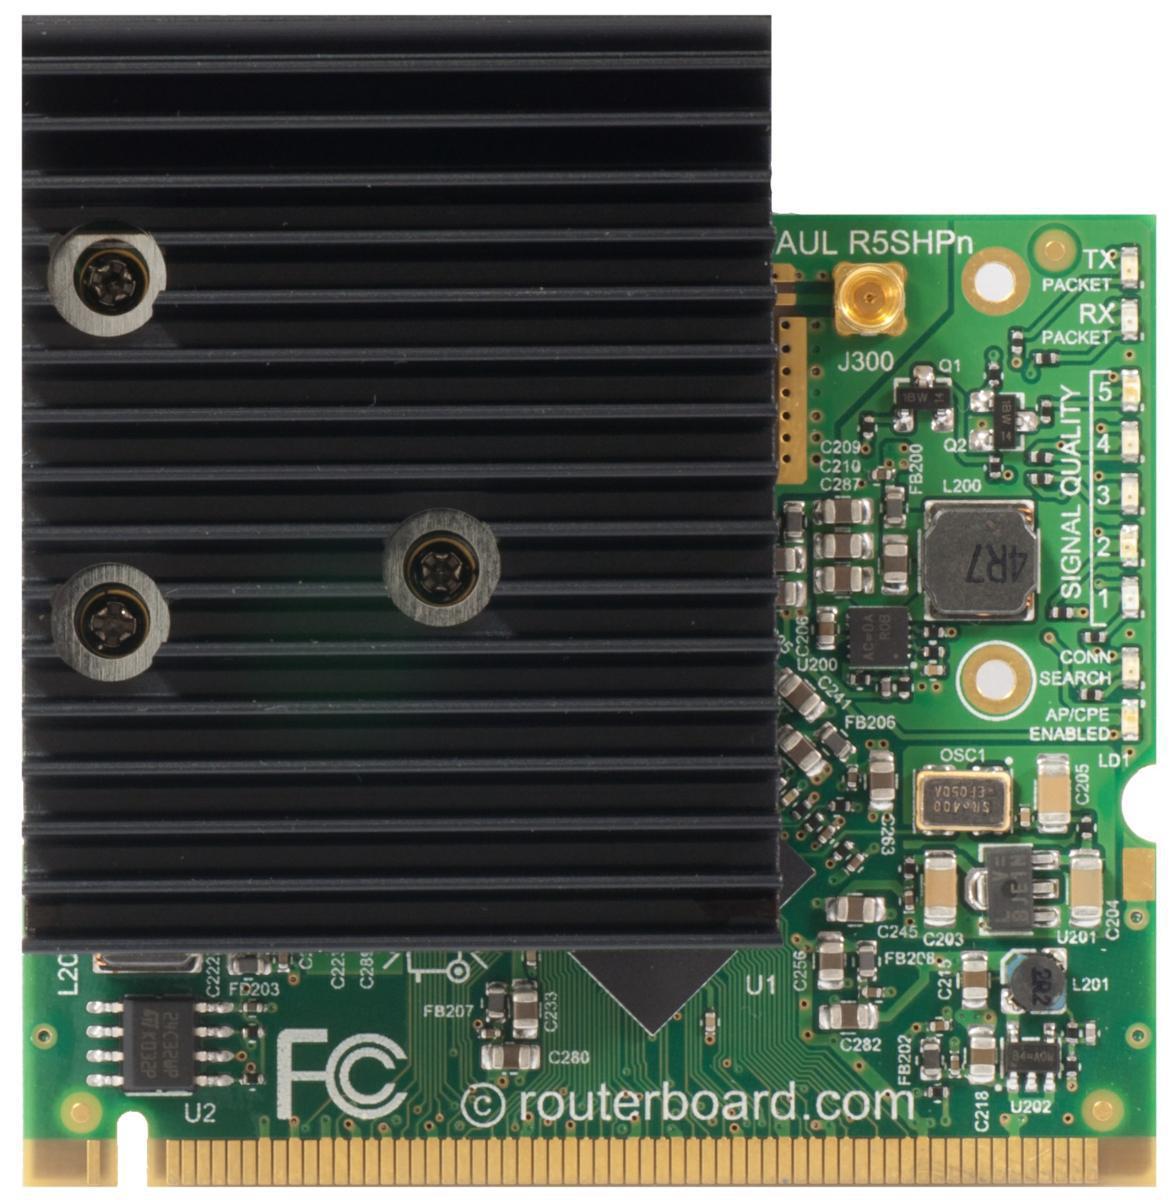 SICE Distributore Ufficiale  Interfaces MikroTik MiniPCI Card with 1MMCXconnectors 802.11a/n Super High Power | R5SHPN